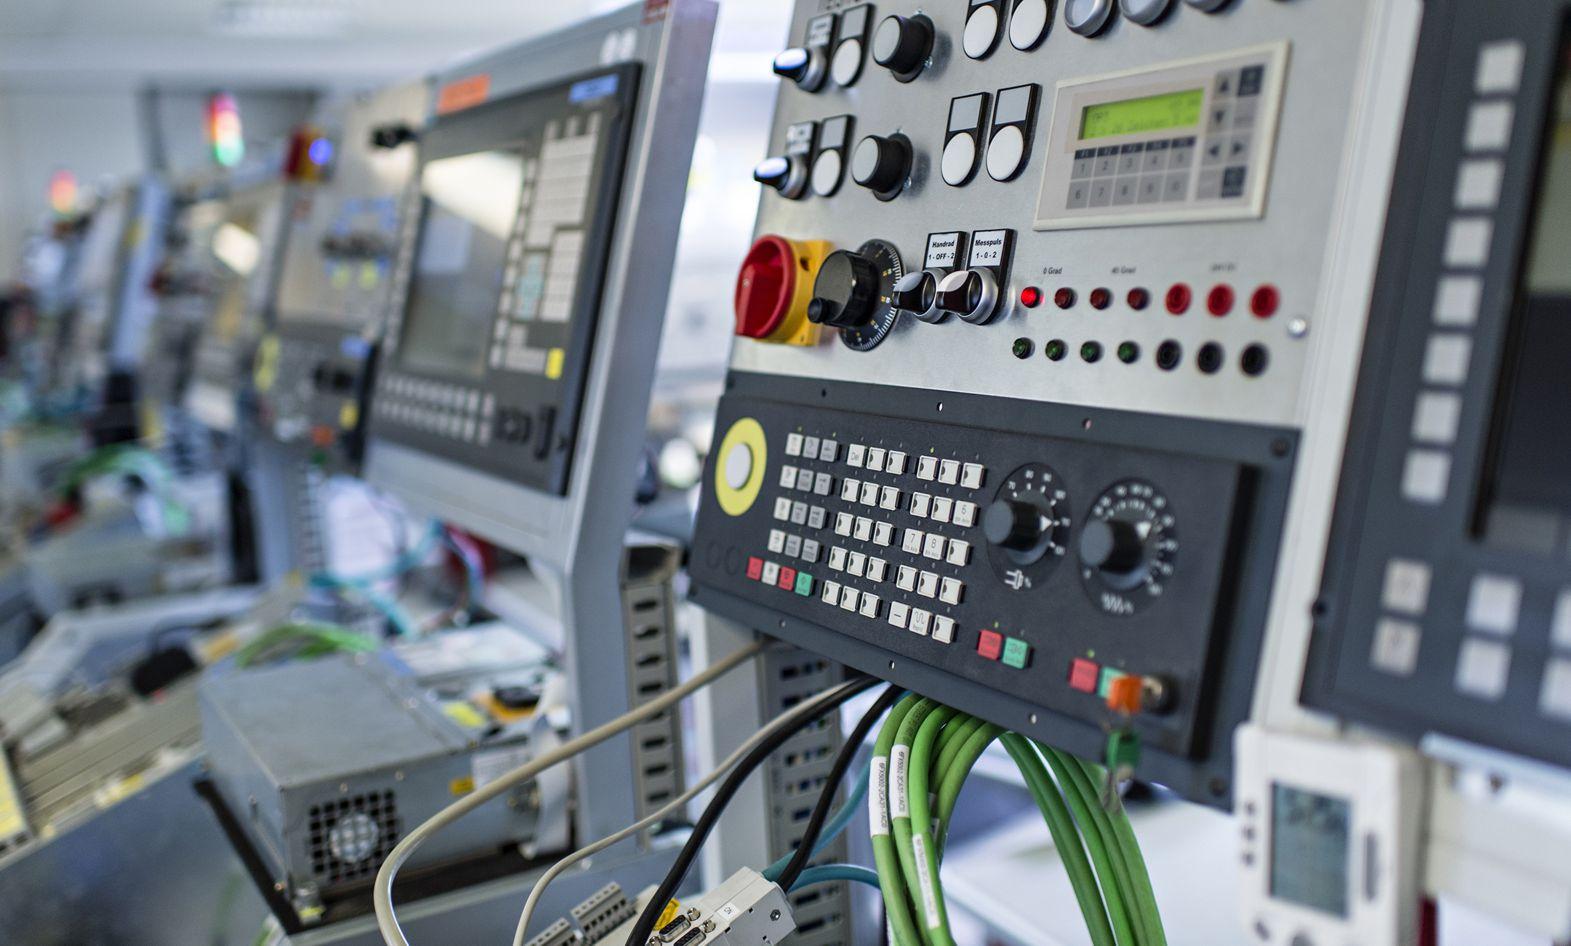 Echip Control Systems Pcb Design In India Pcb Design In